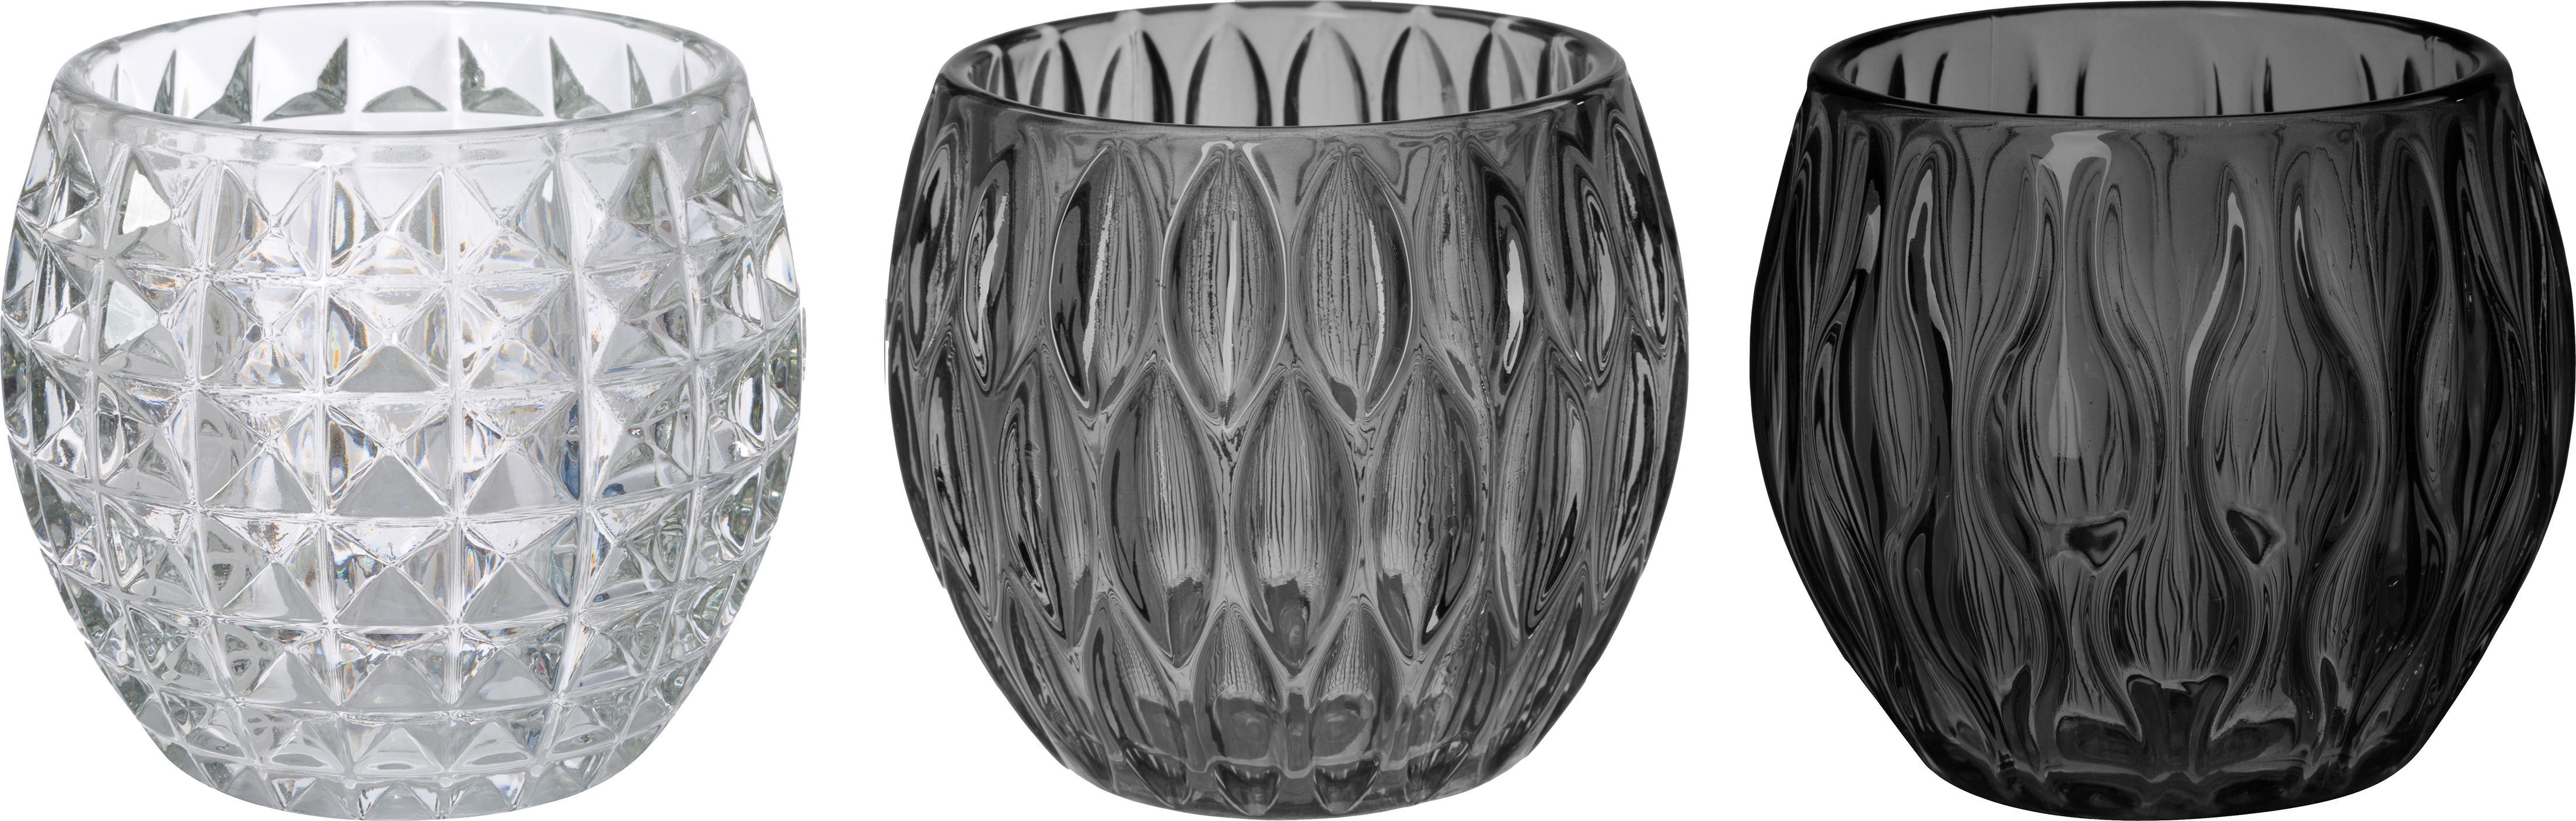 Set di 3 portacandele Aliza, Vetro, Grigio trasparente, Ø 10 x Alt. 9 cm